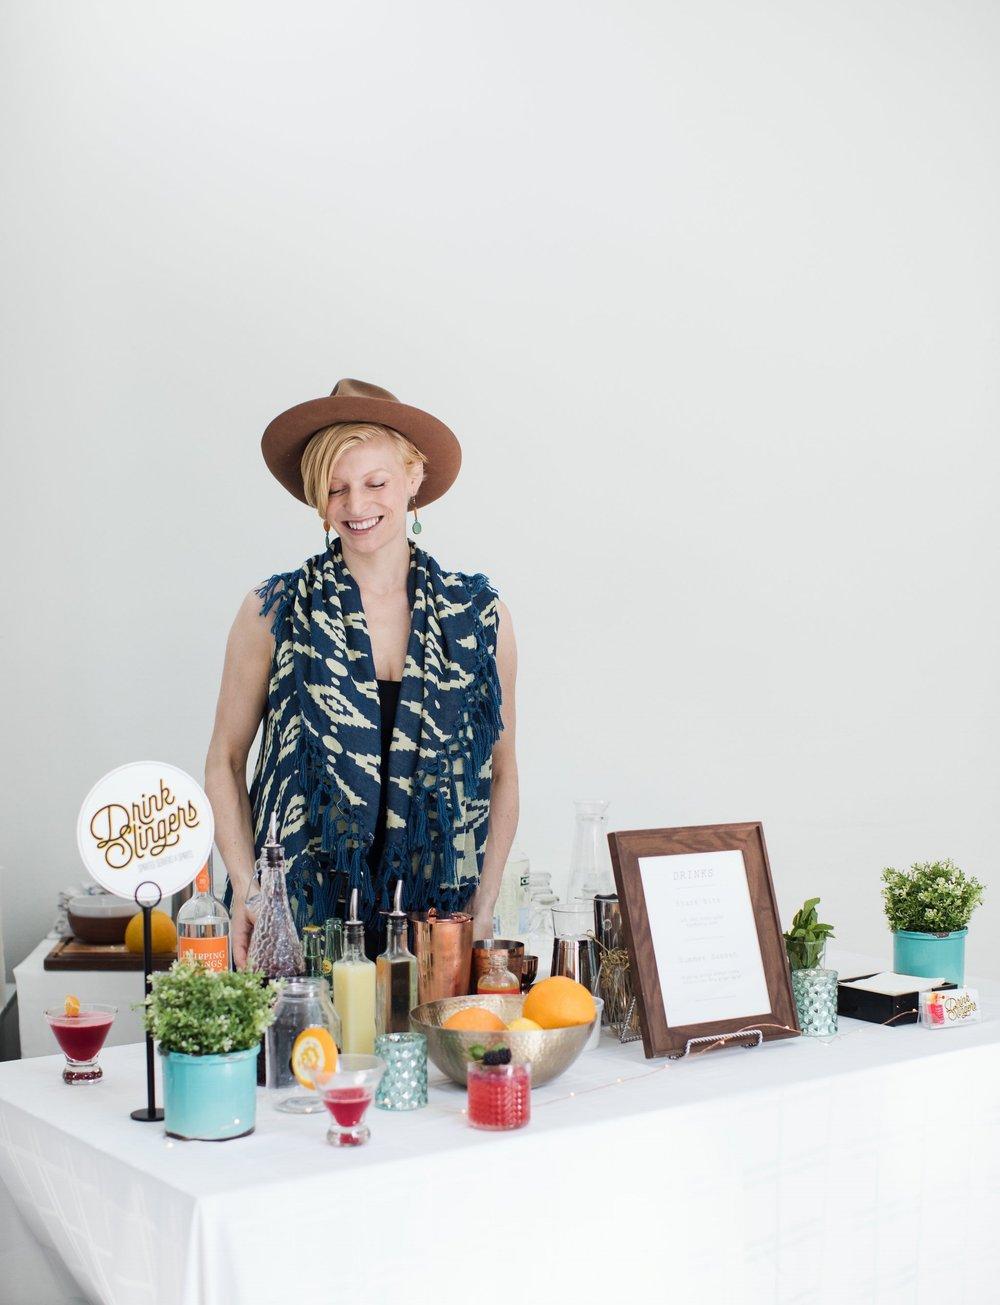 austin-event-bartender-standard-slinger-image-4.jpg